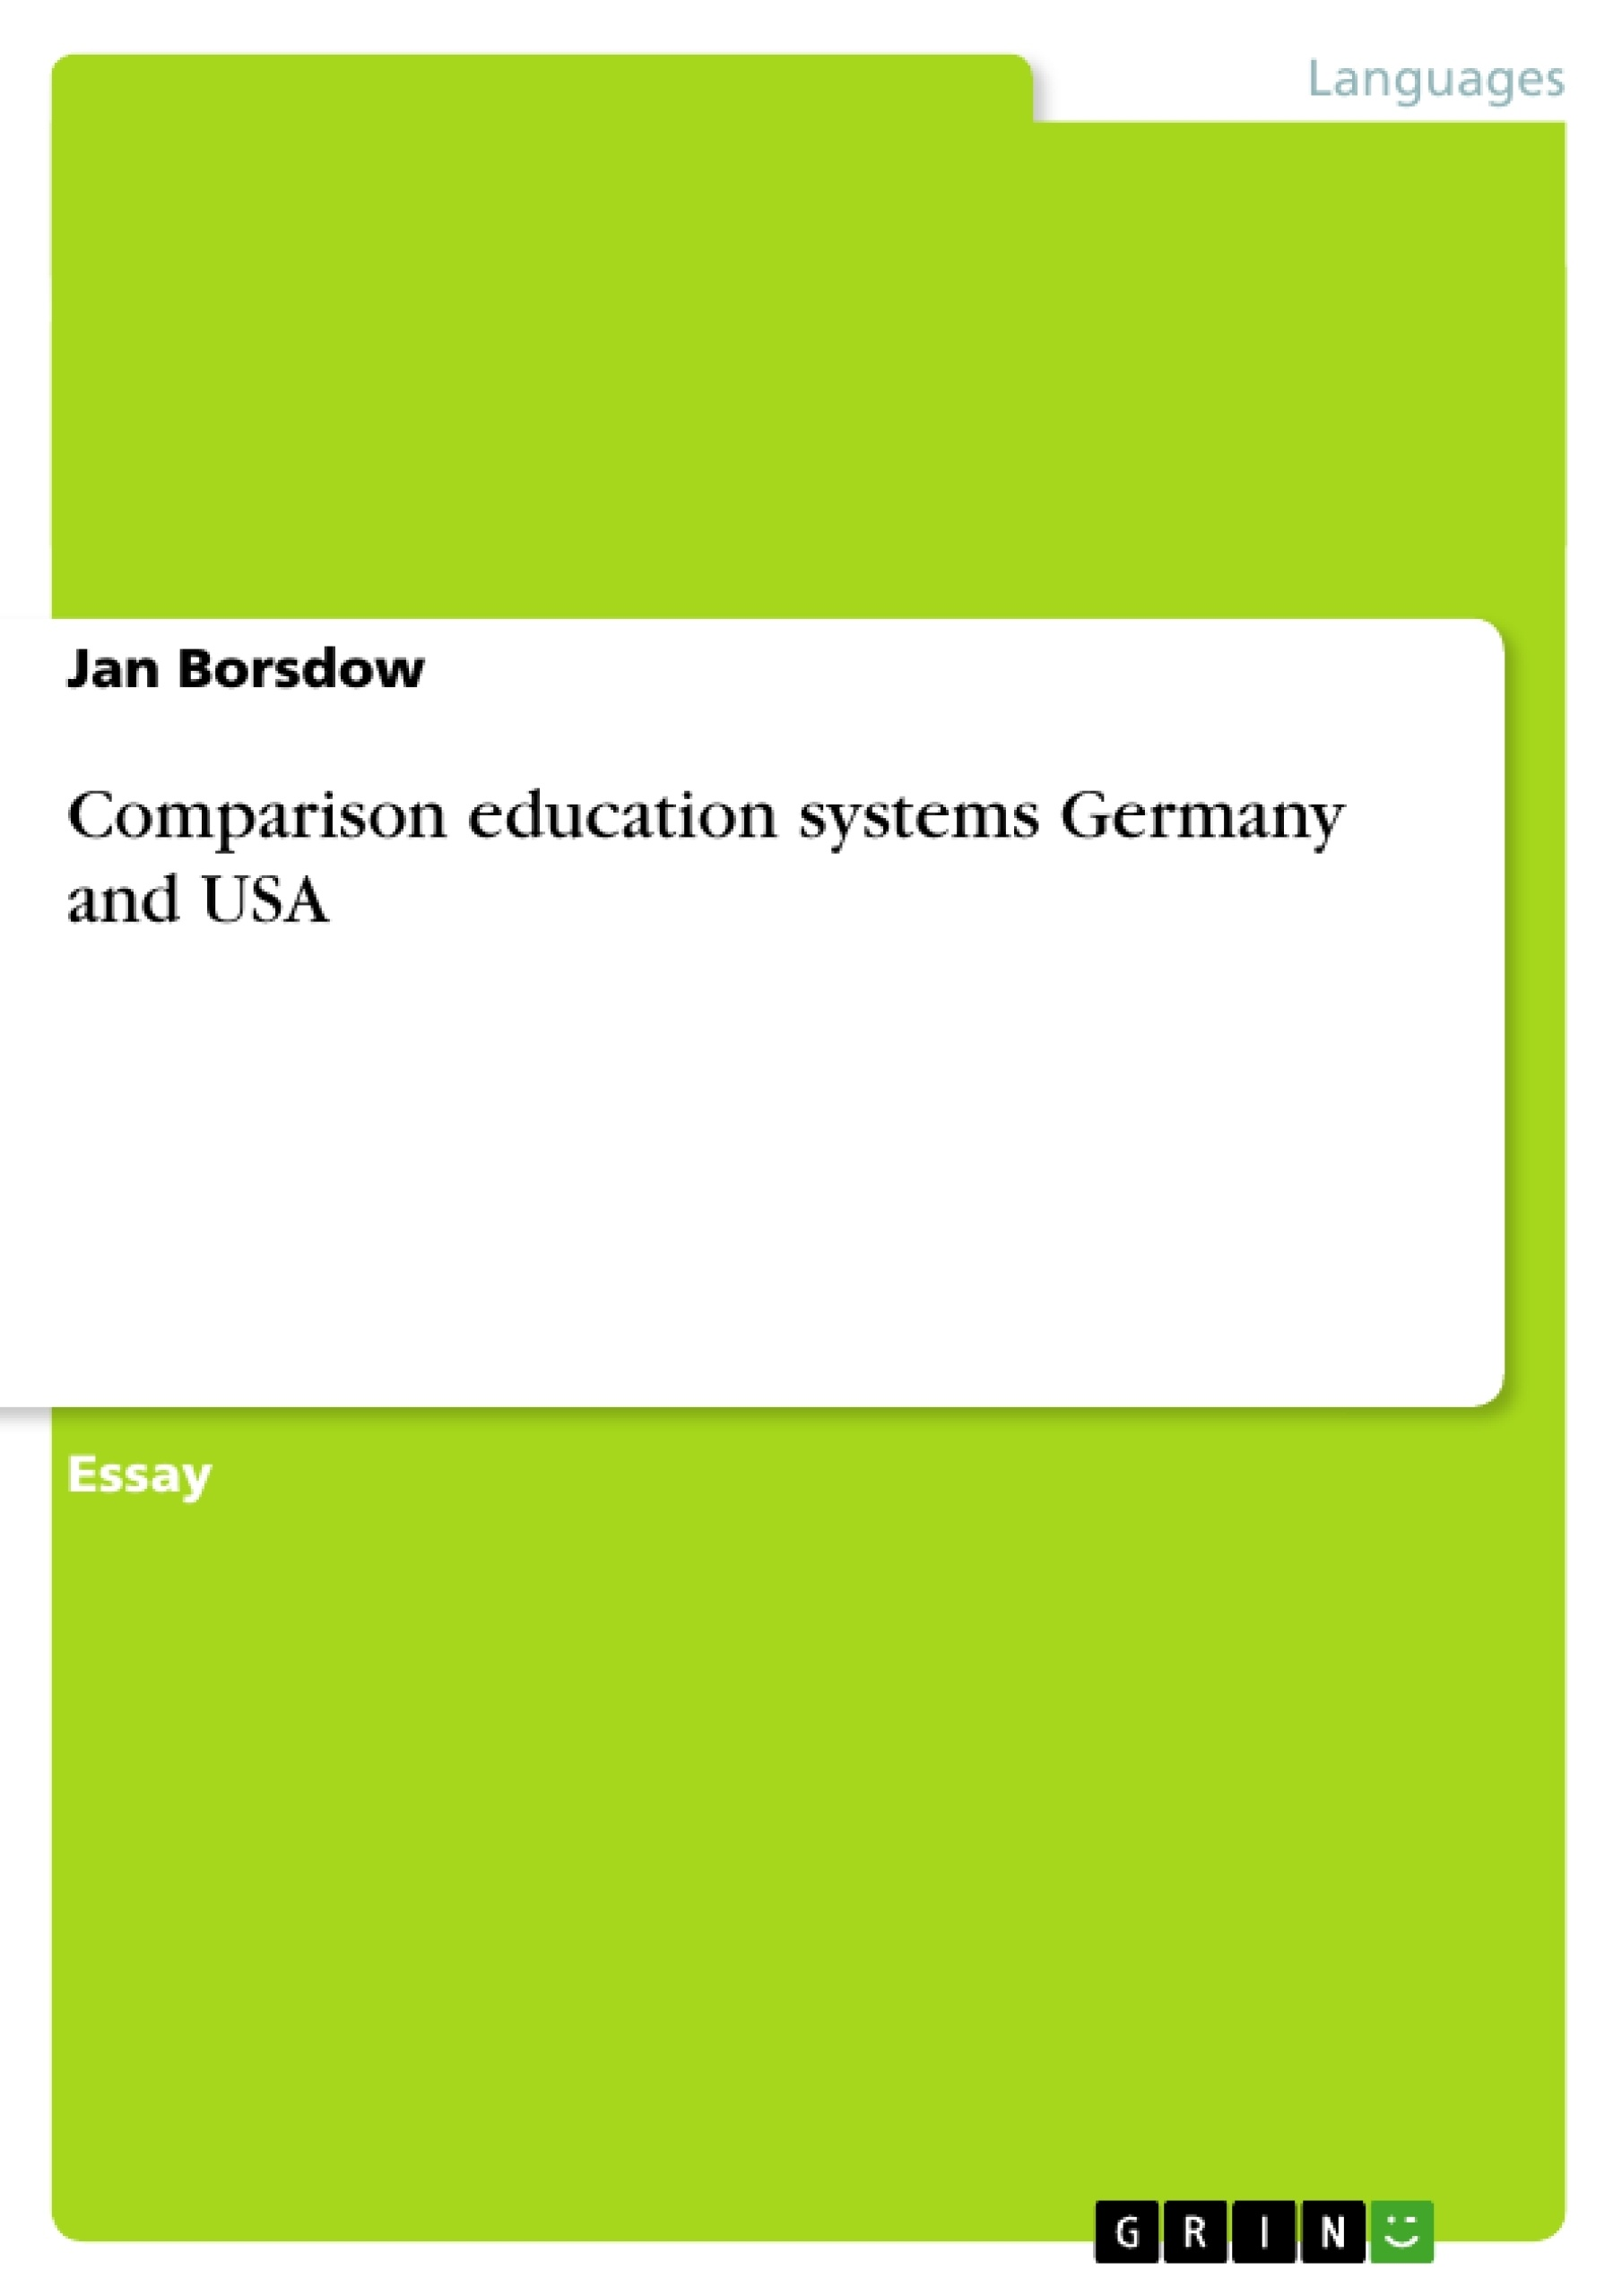 essay comparing education system